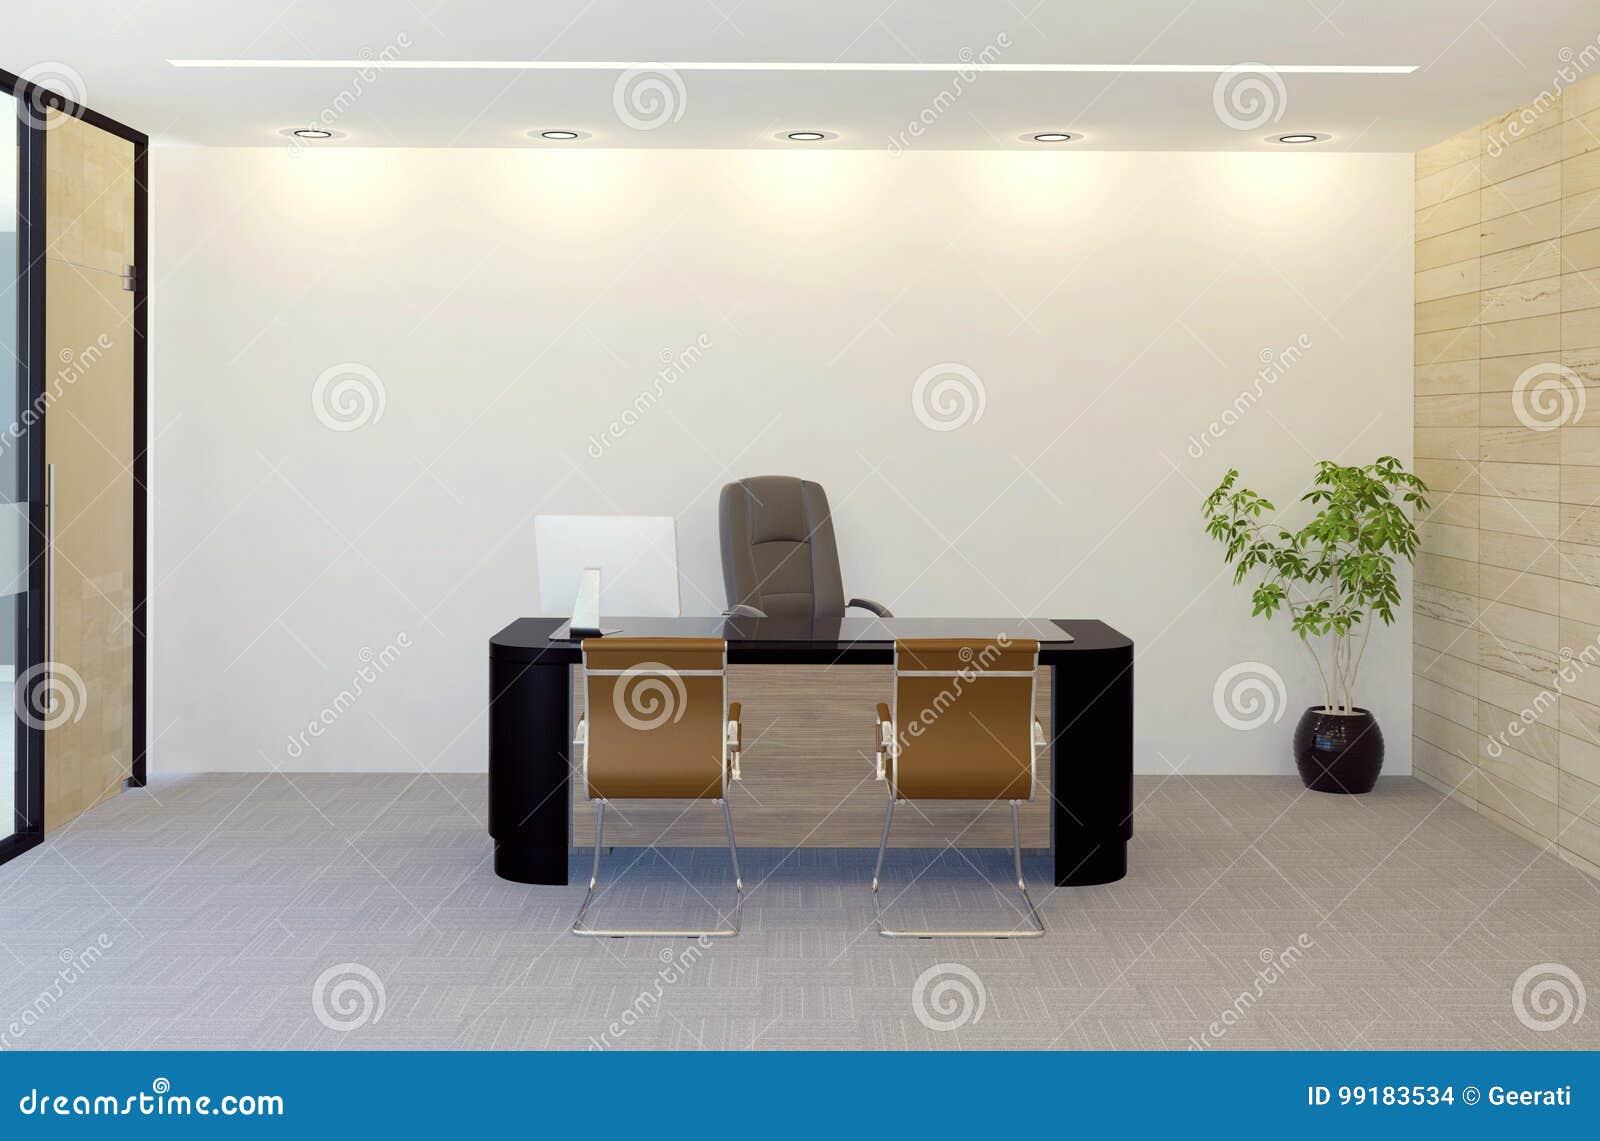 Moderner Direktionsbüro-Rauminnenraum Stock Abbildung - Illustration ...